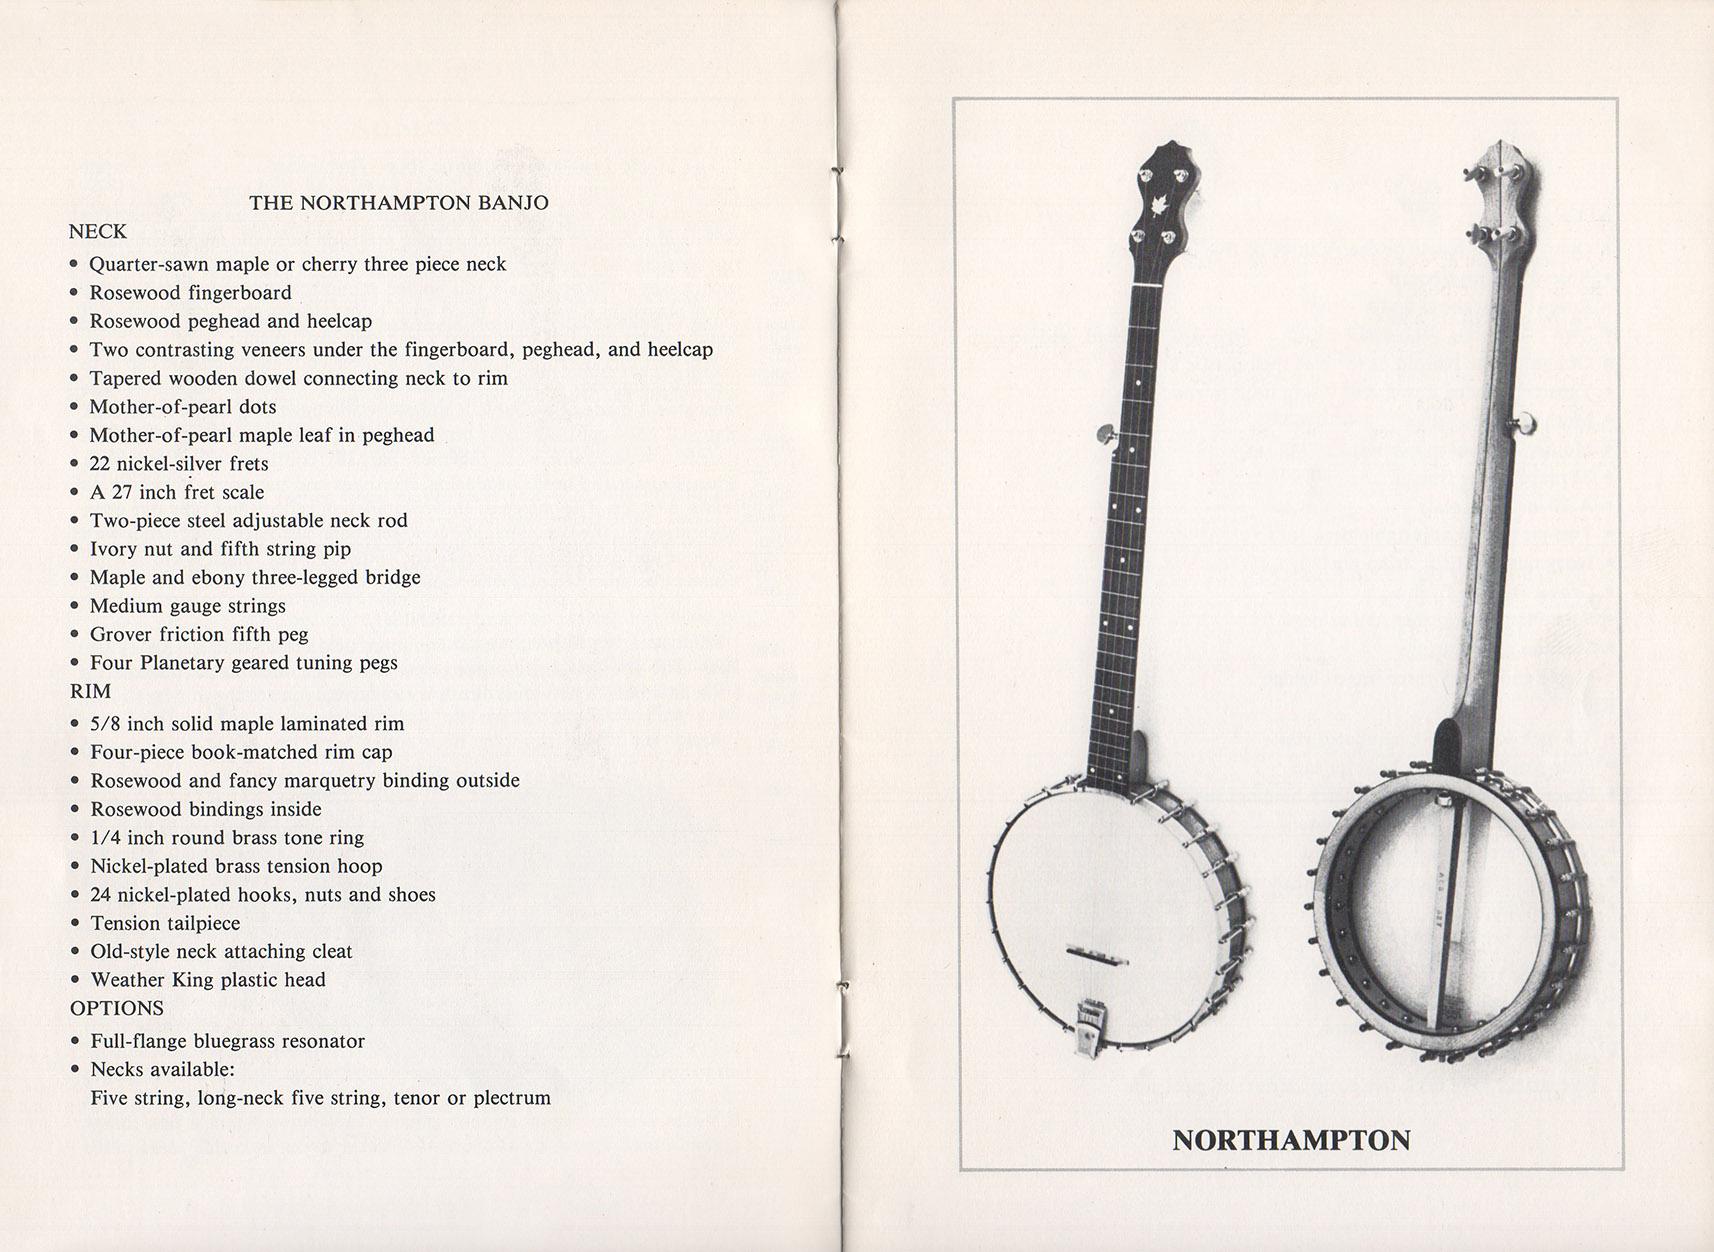 A E Smith Banjo Company Catalog NorthHampton